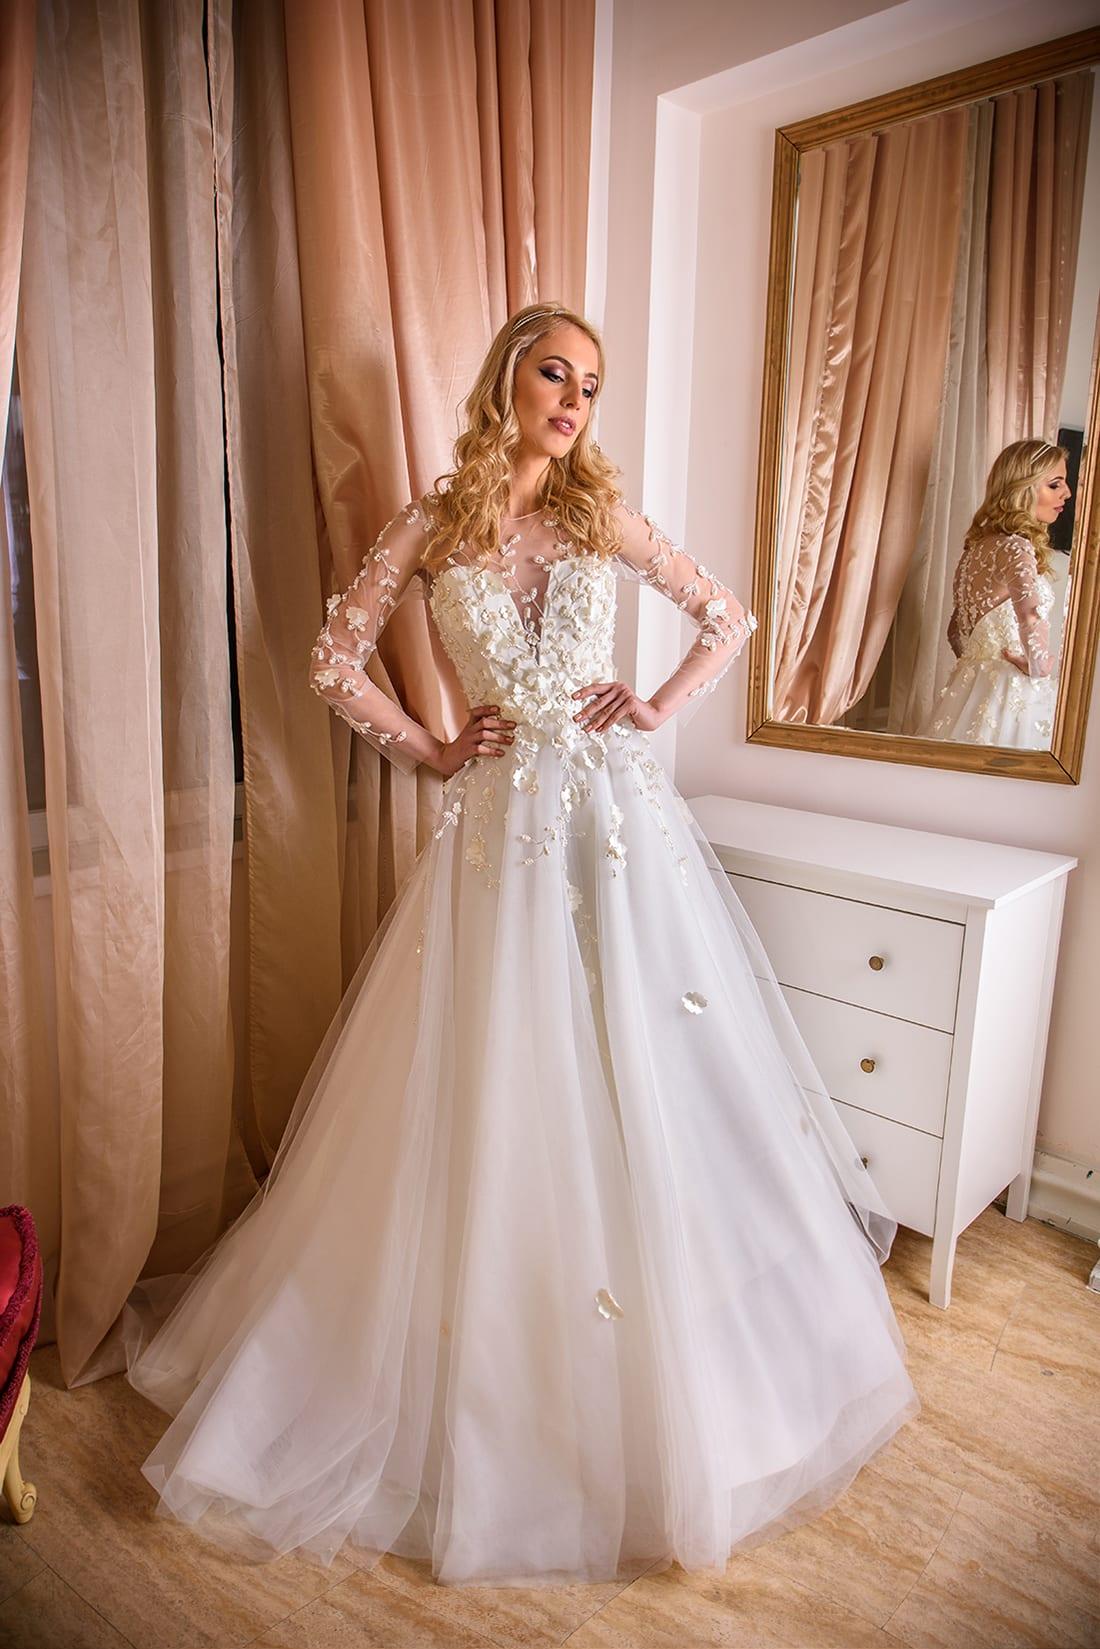 Natasha Model - Colectia Baroque - Adora Sposa